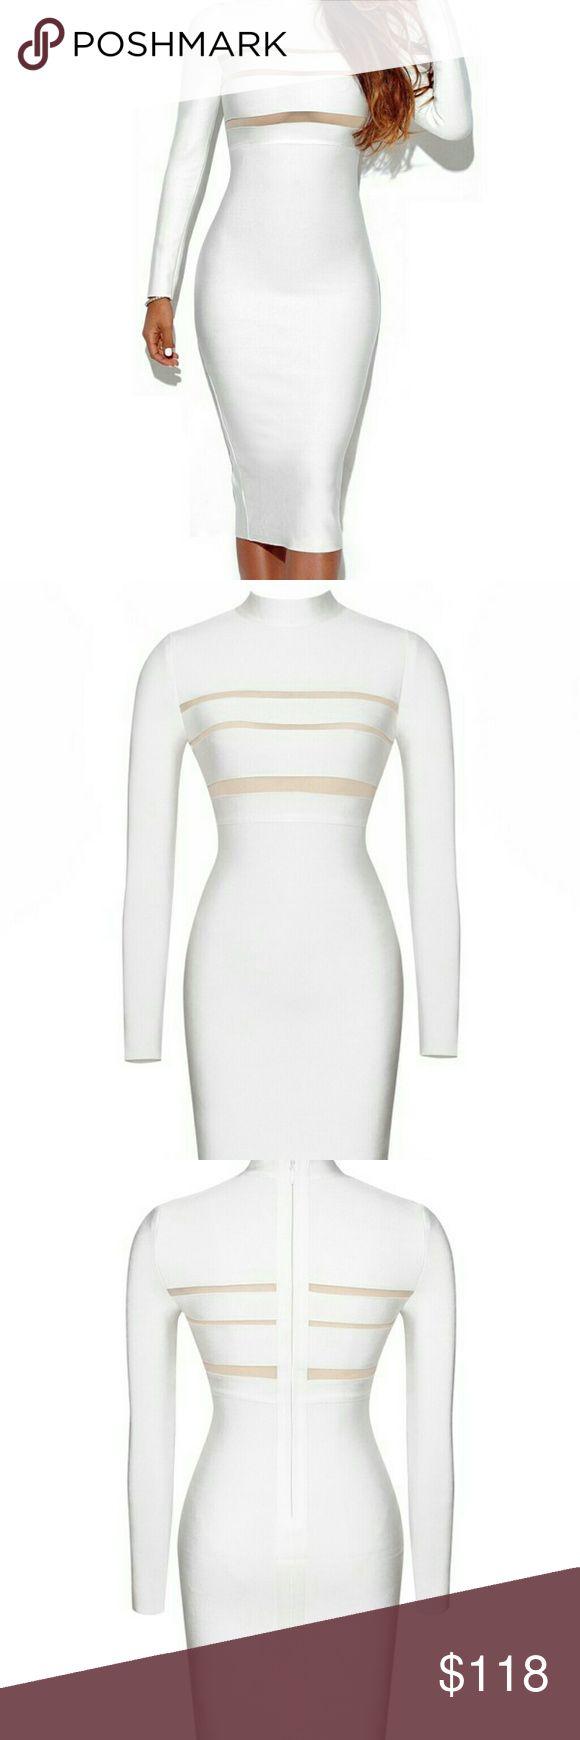 Winter White Bandage Dress Long sleeve bandage dress with sheer strioe cutout details.  Length: Approx 42inch/105cm Dresses Long Sleeve